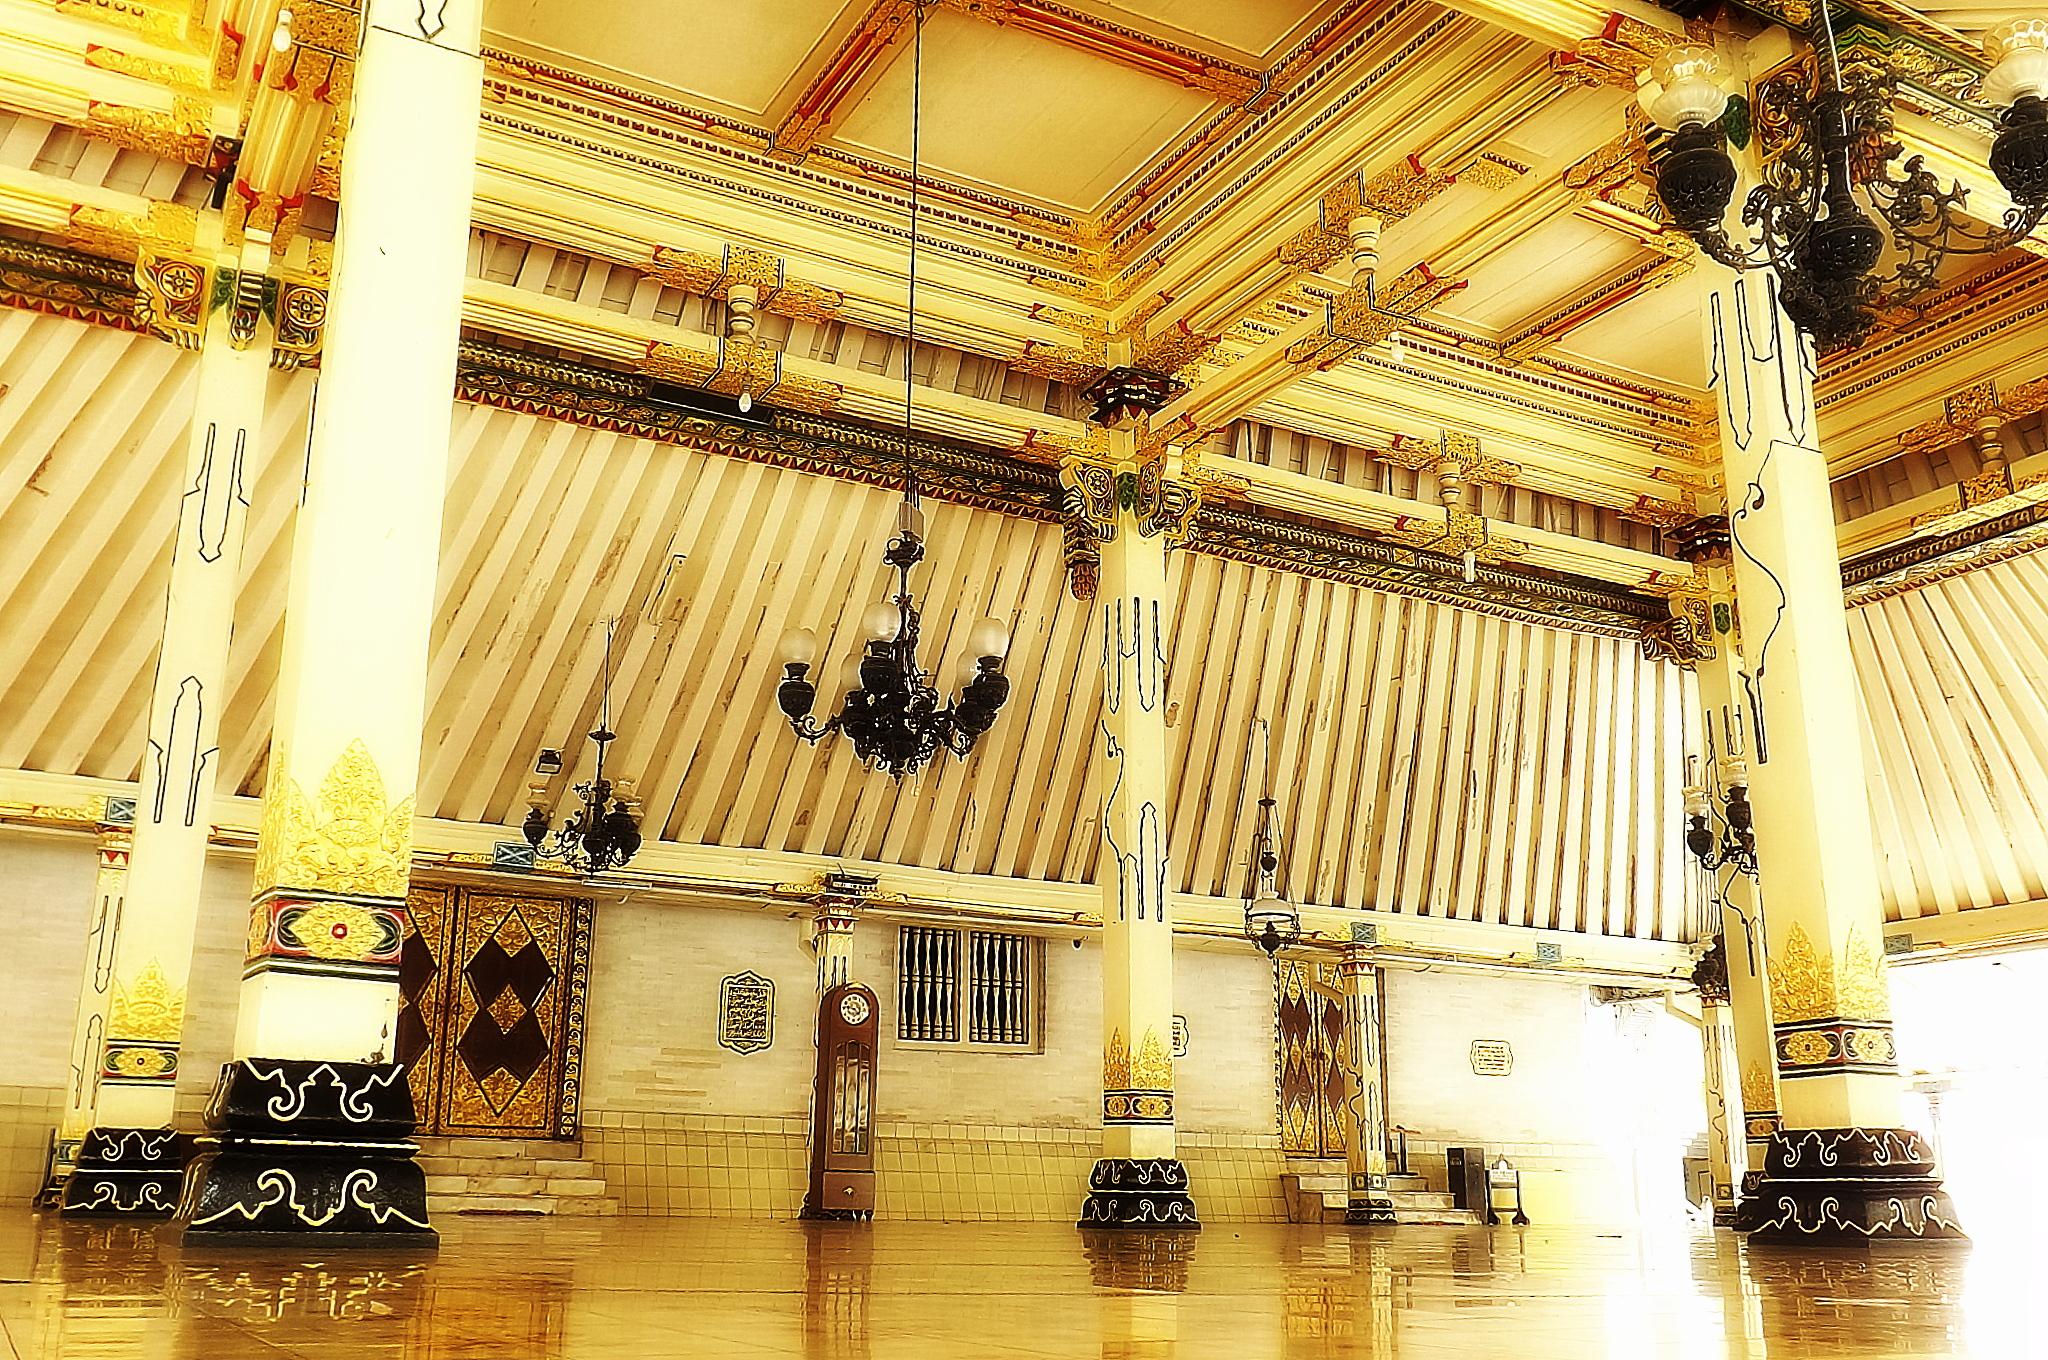 Kauman Dulu Nanti Komunitas Blusukan Kampoeng Jogja Serambi Masjid Gede